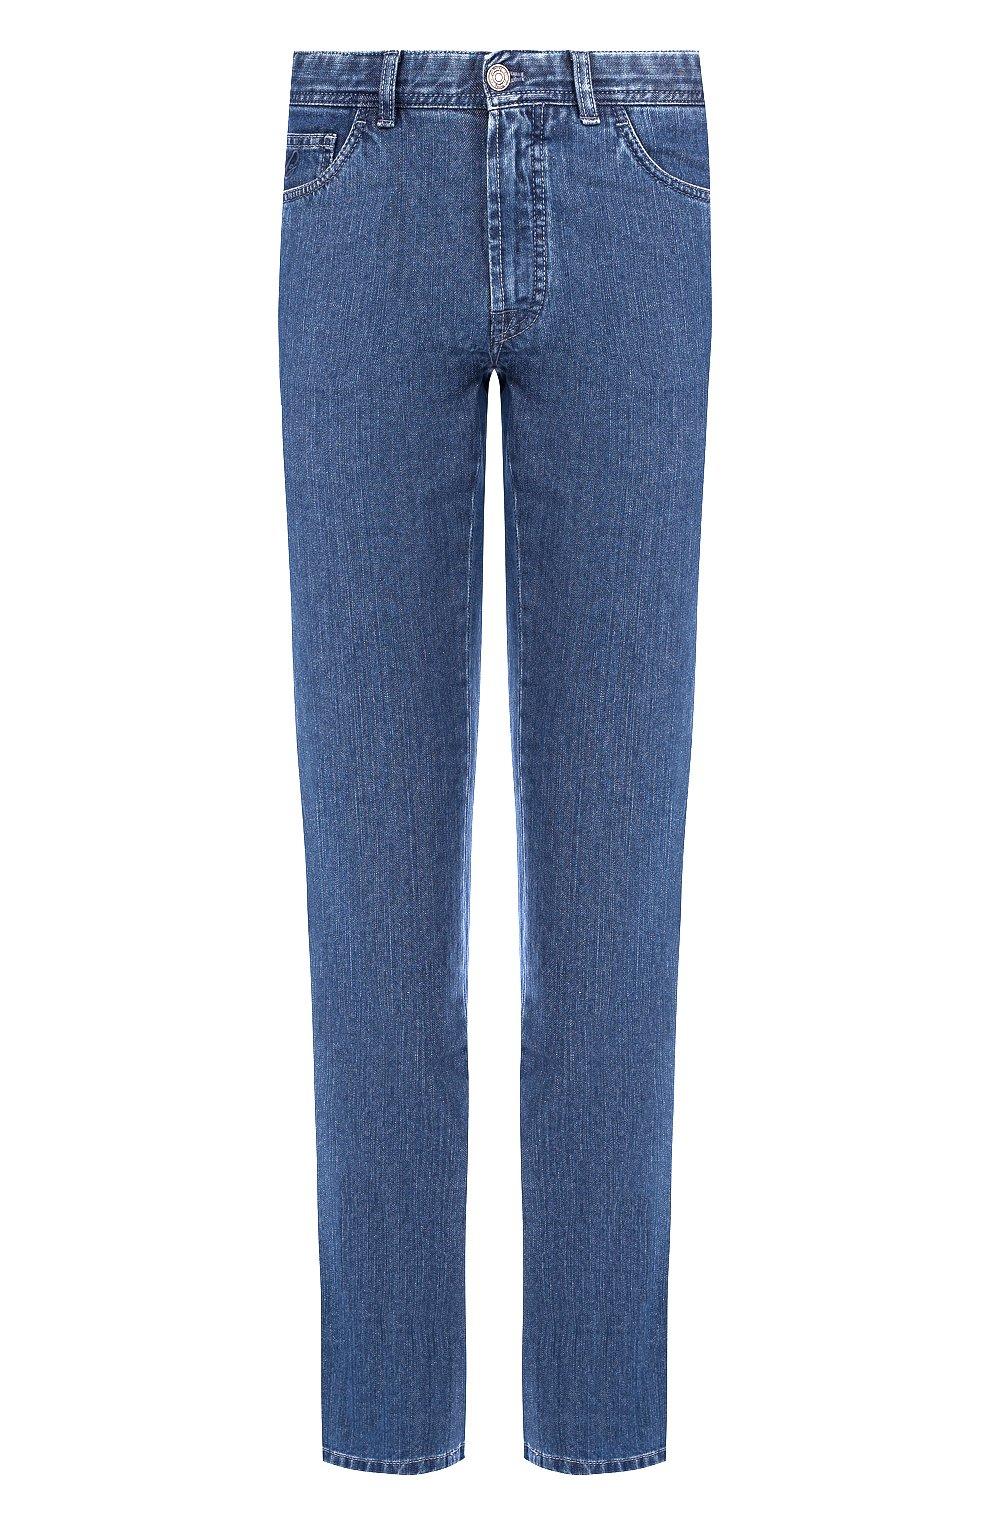 Мужские джинсы прямого кроя BRIONI синего цвета, арт. SPLE0L/07D13/CHAM0NIX | Фото 1